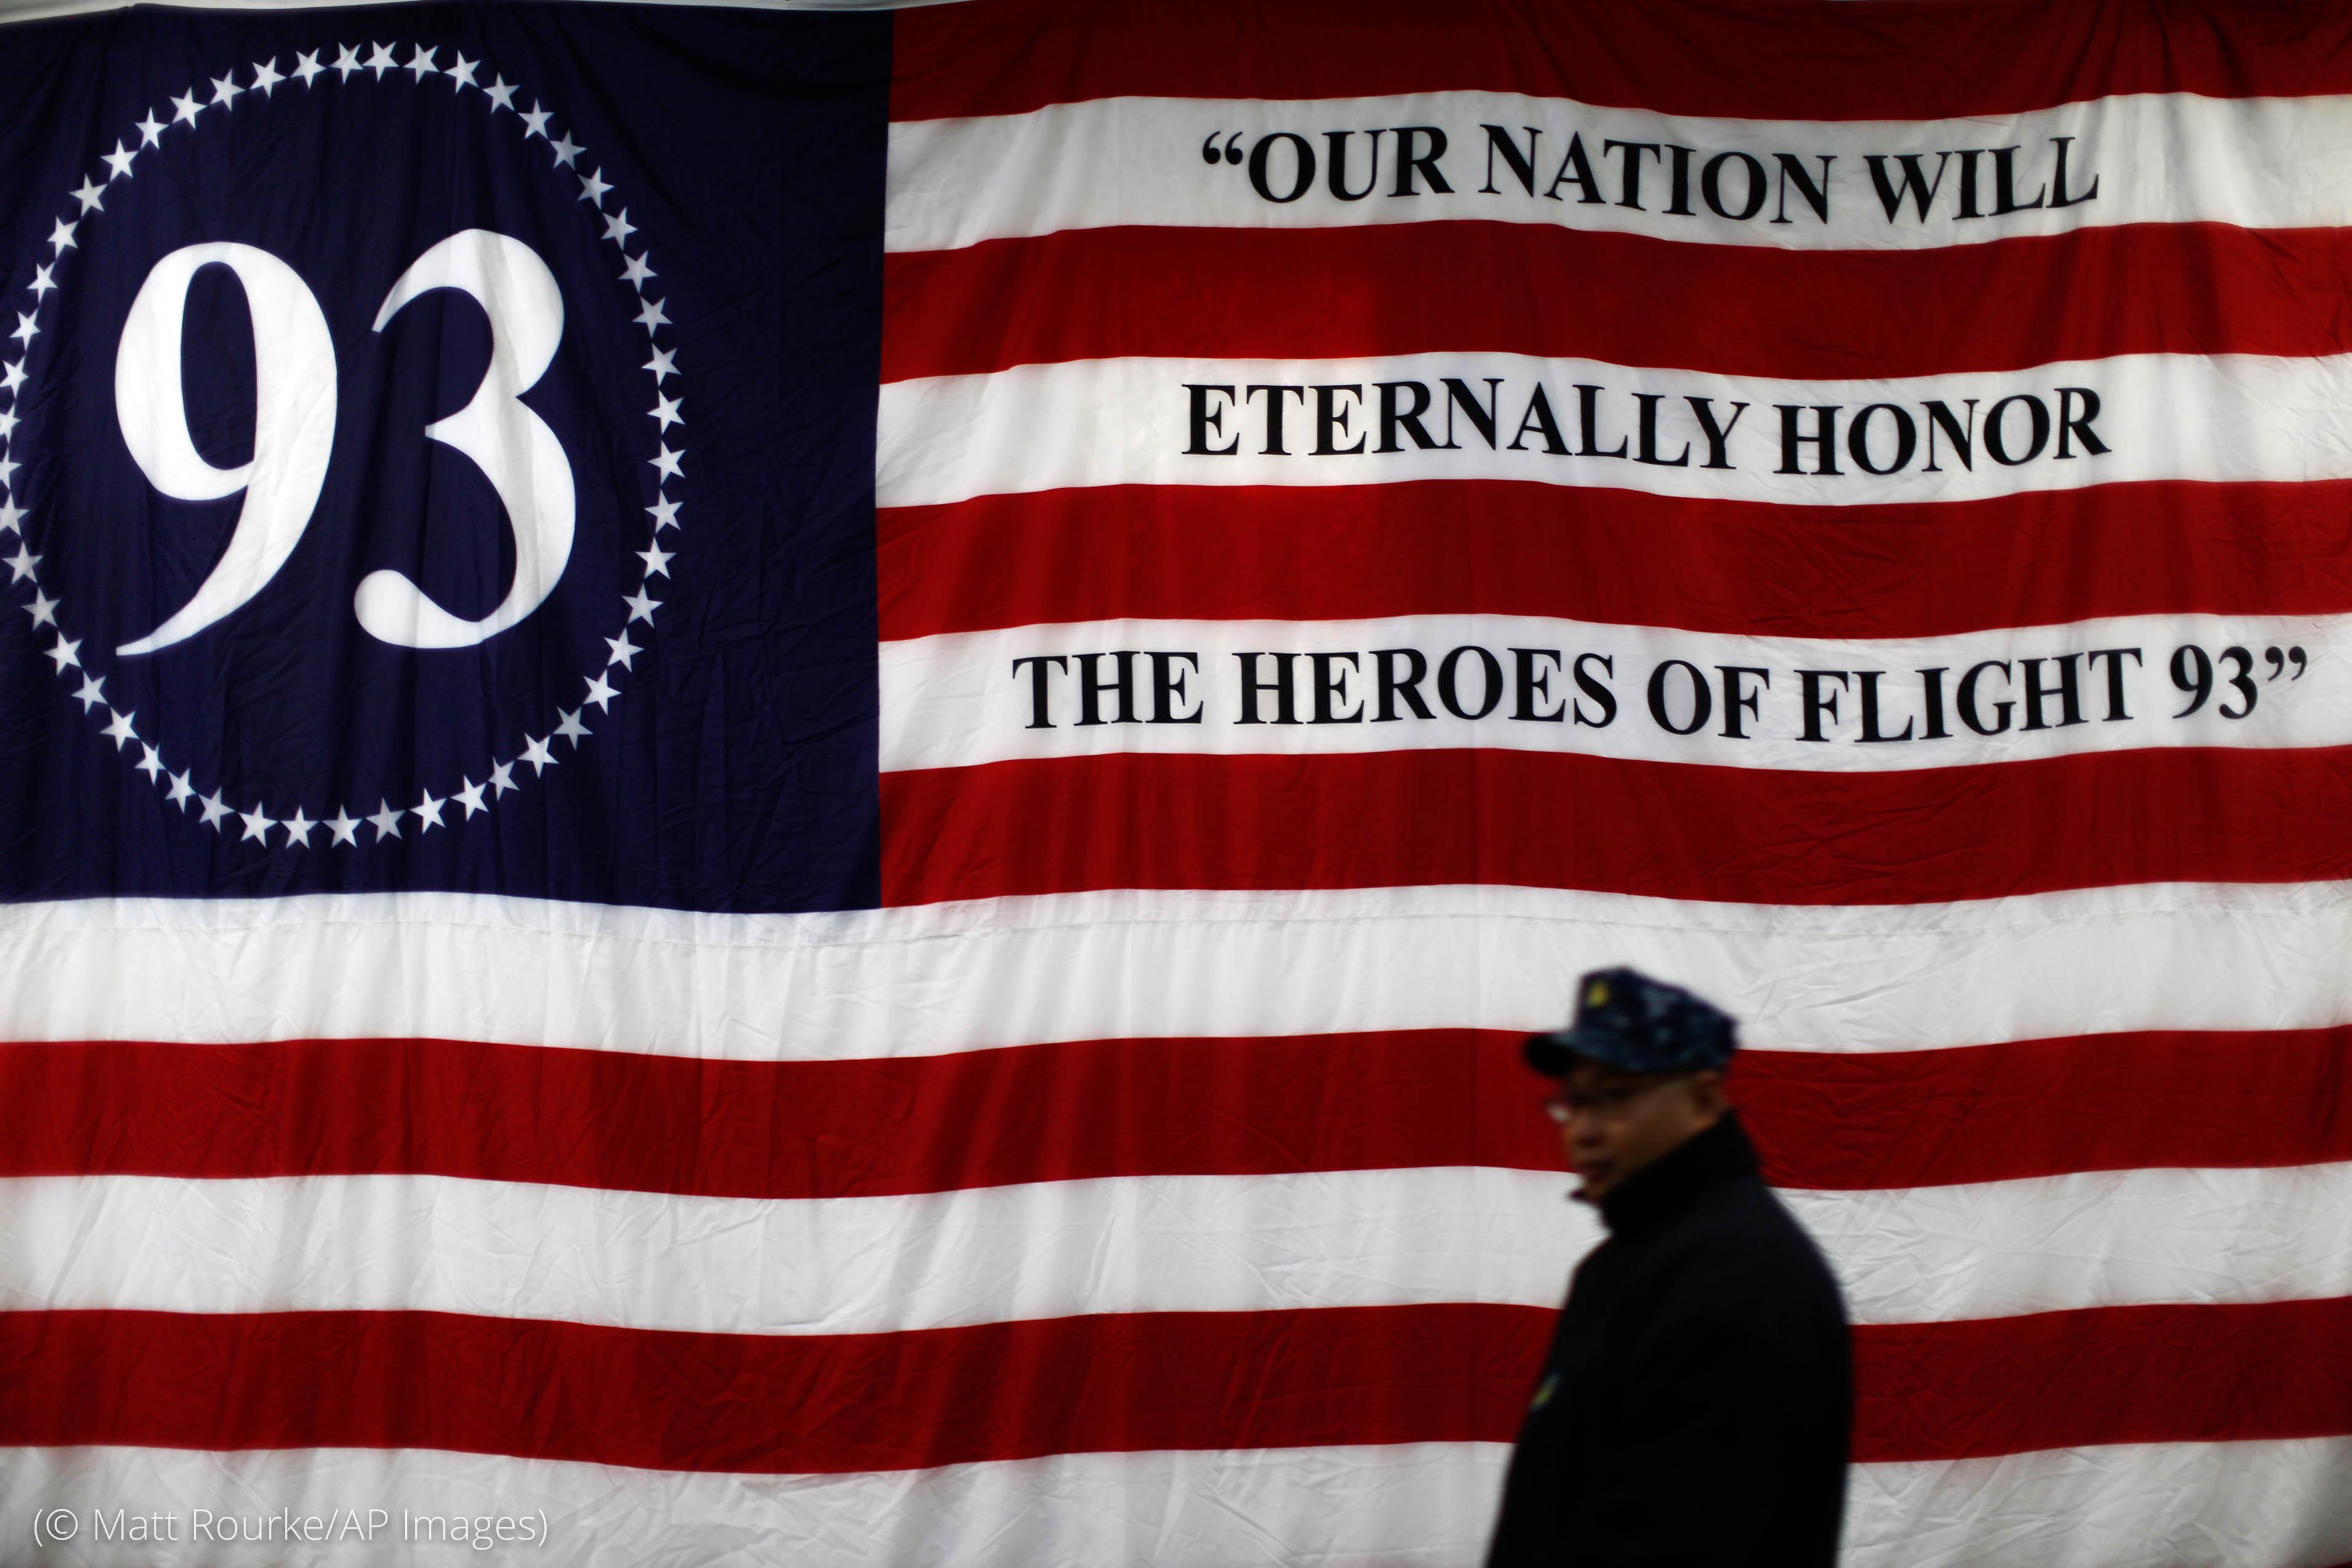 Sailor walking past large red, white and blue flag commemorating United Flight 93 (© Matt Rourke)